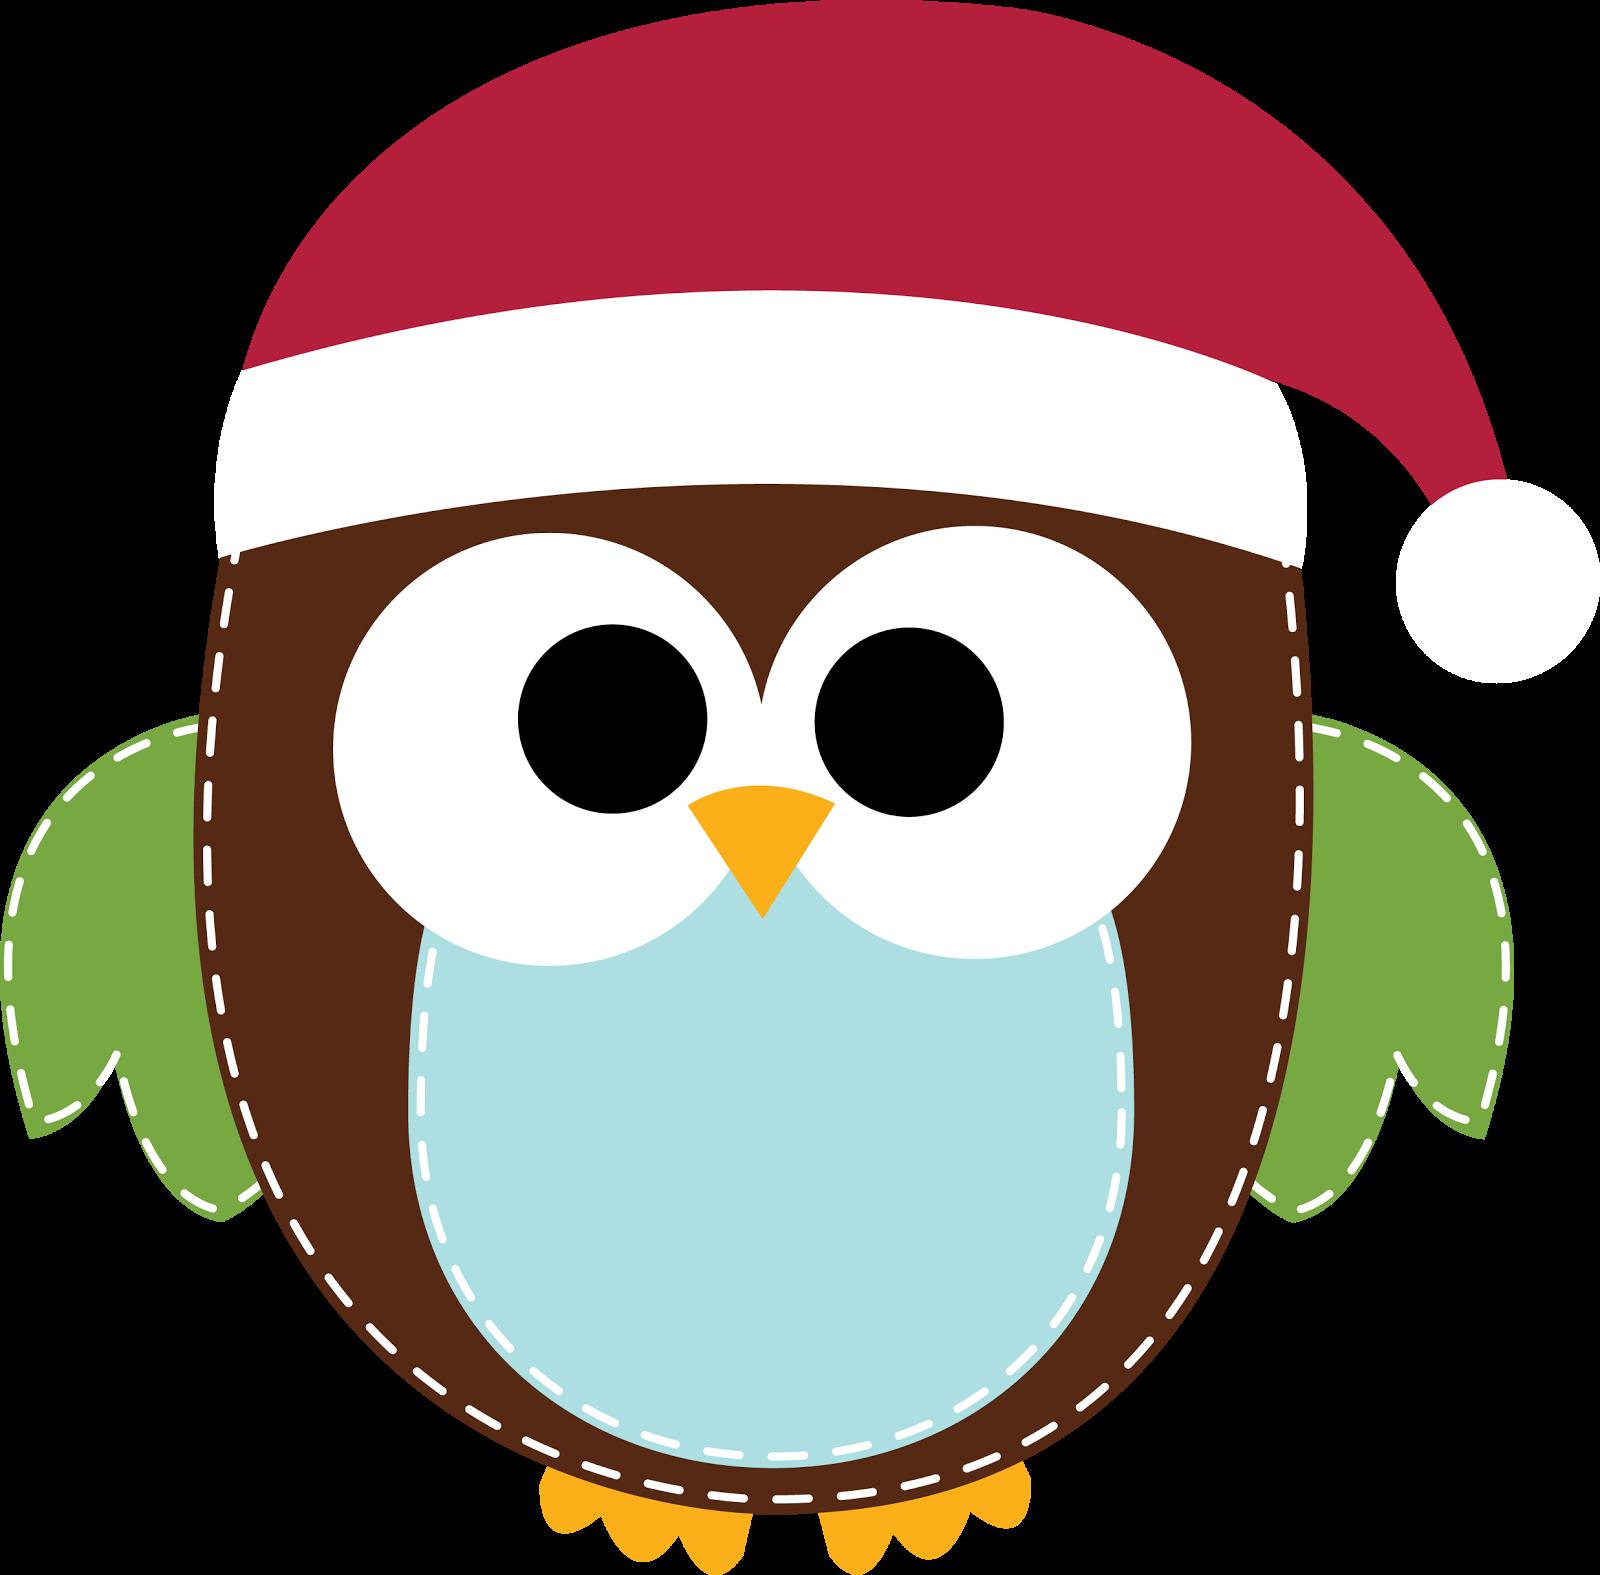 Kbb clipart png transparent Free Christmas Backgrounds Clipart, Download Free Clip Art, Free ... png transparent